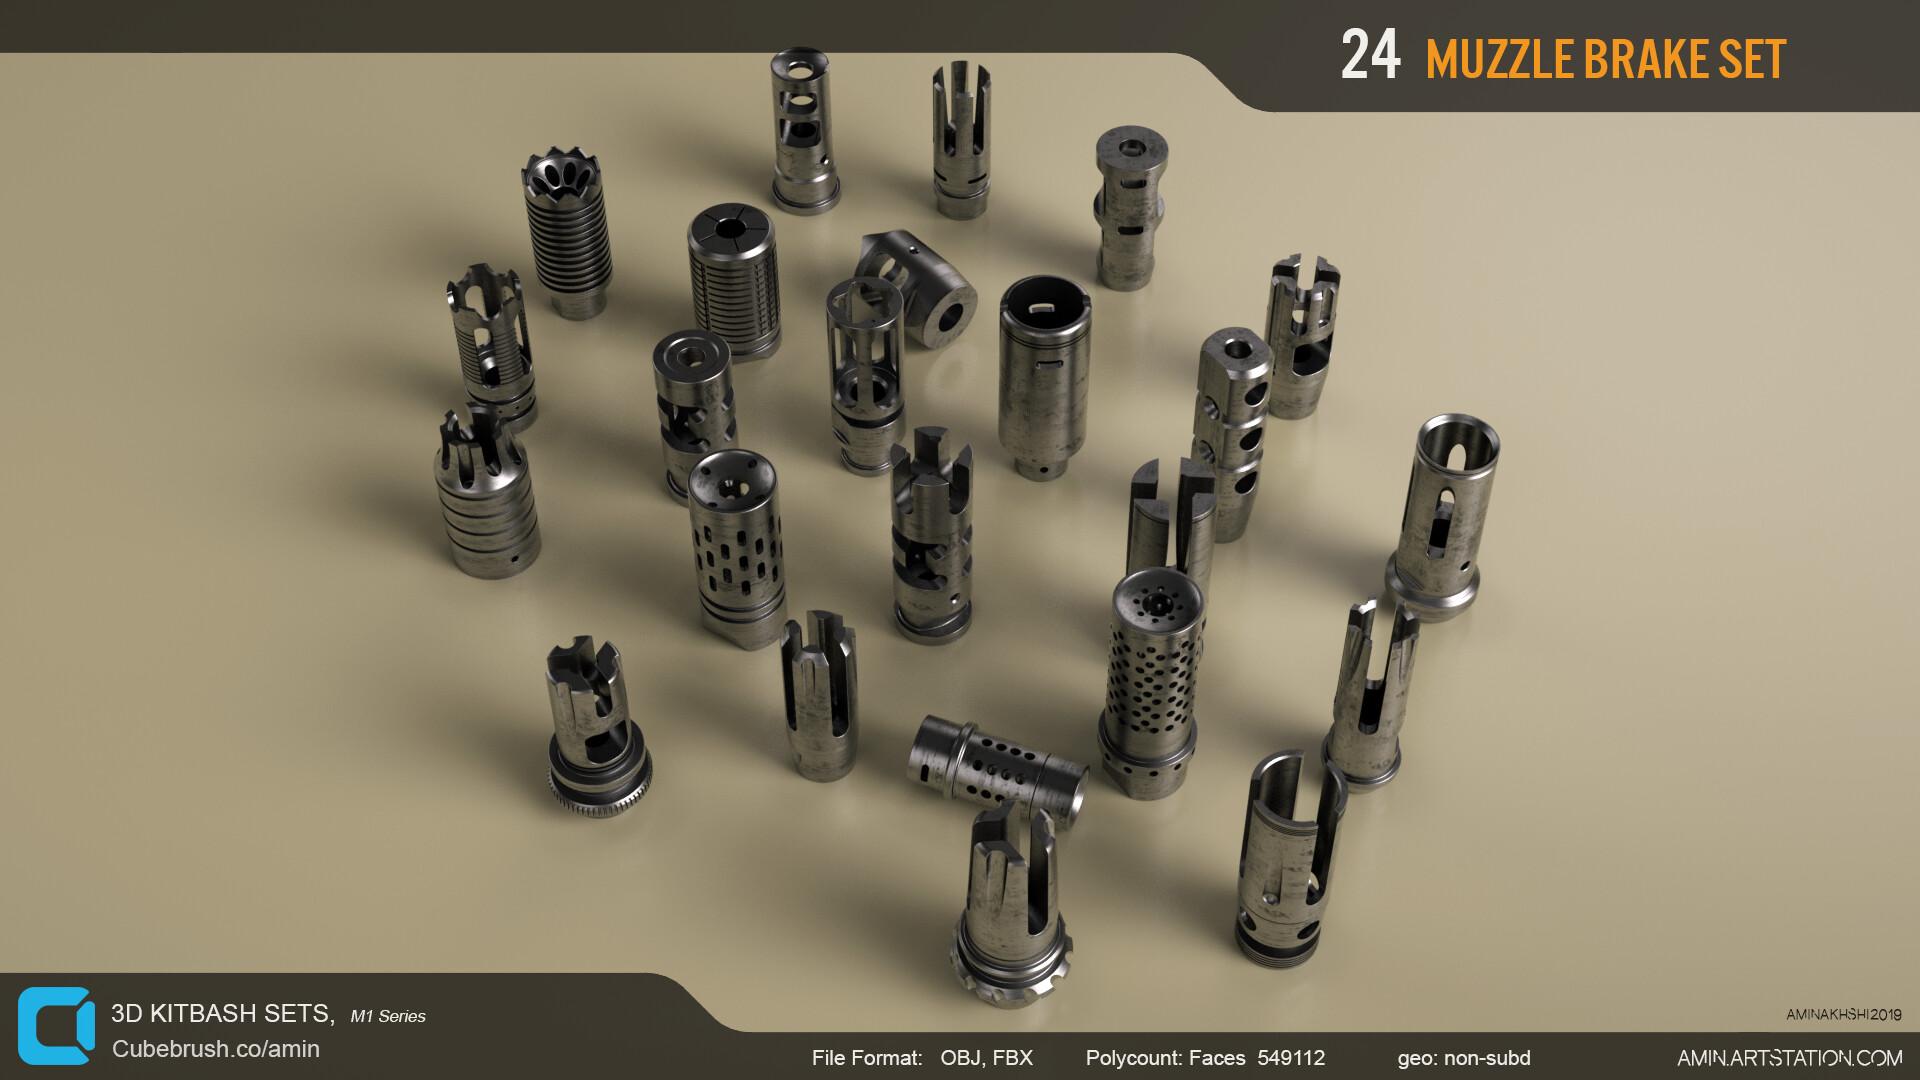 Amin akhshi 008 muzzle brakes set